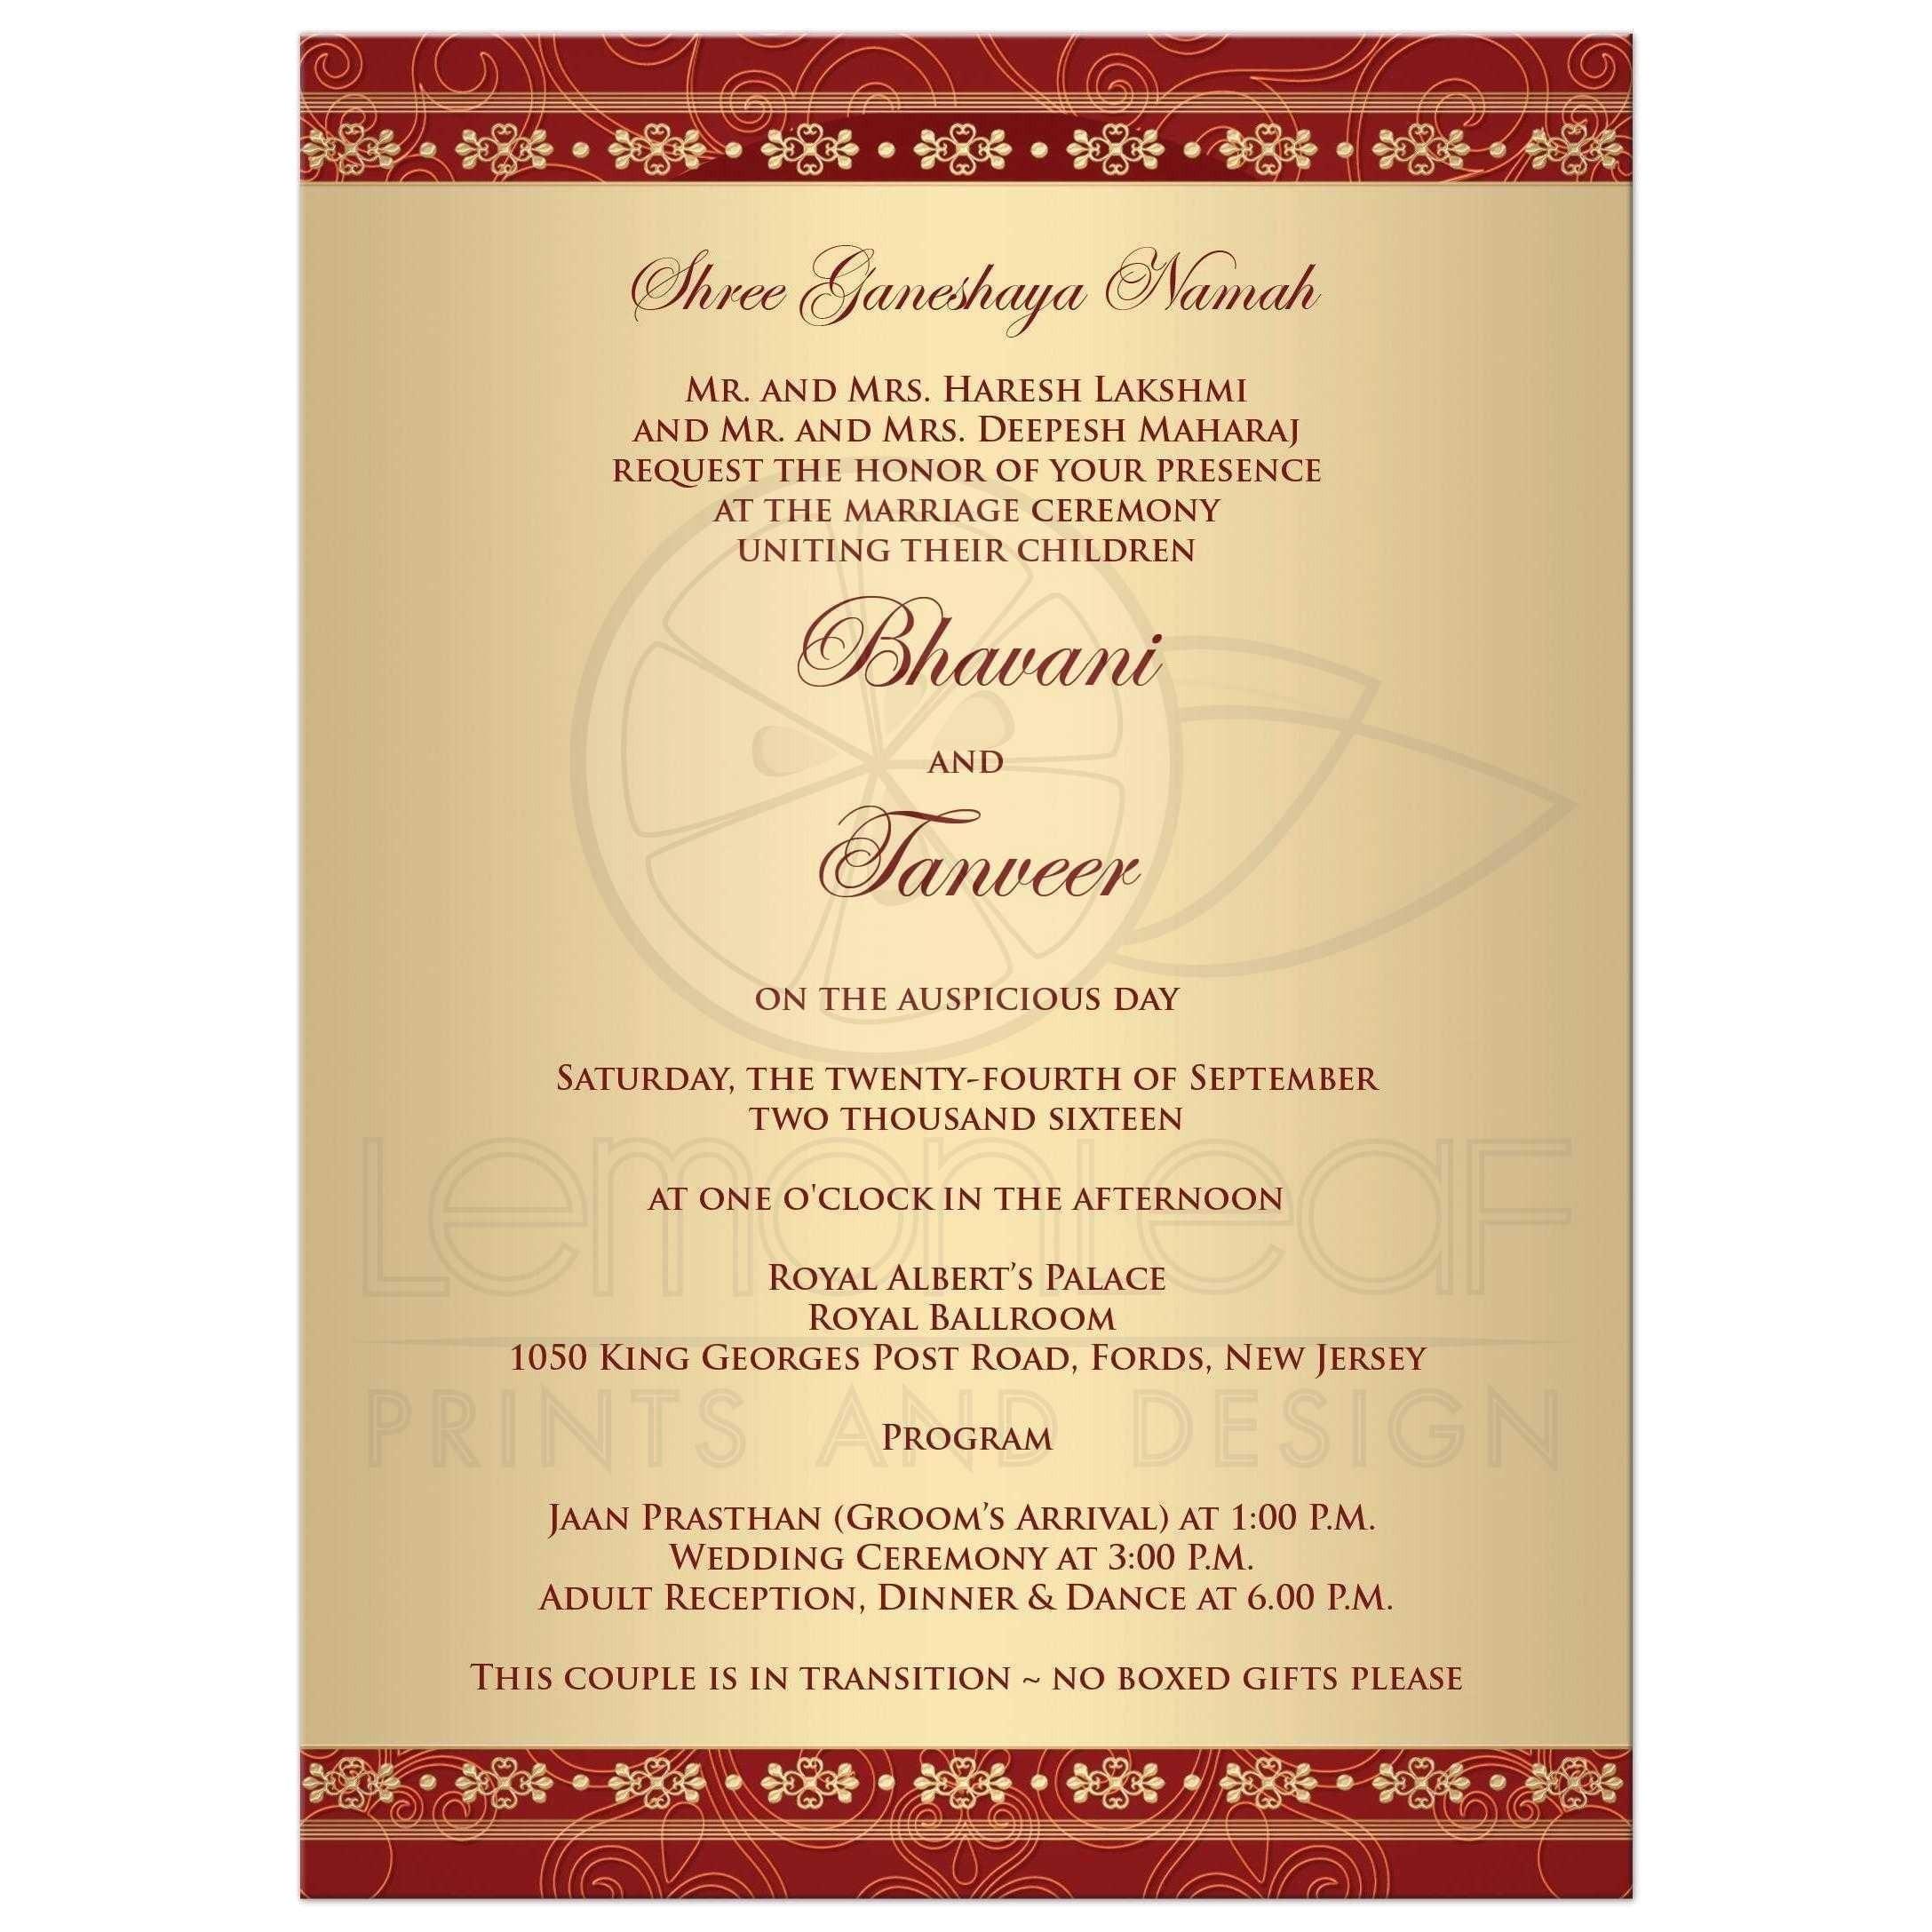 kerala wedding invitation cards matter fresh hindu cool card sample example texts in nigeria pakistan indian template jpg